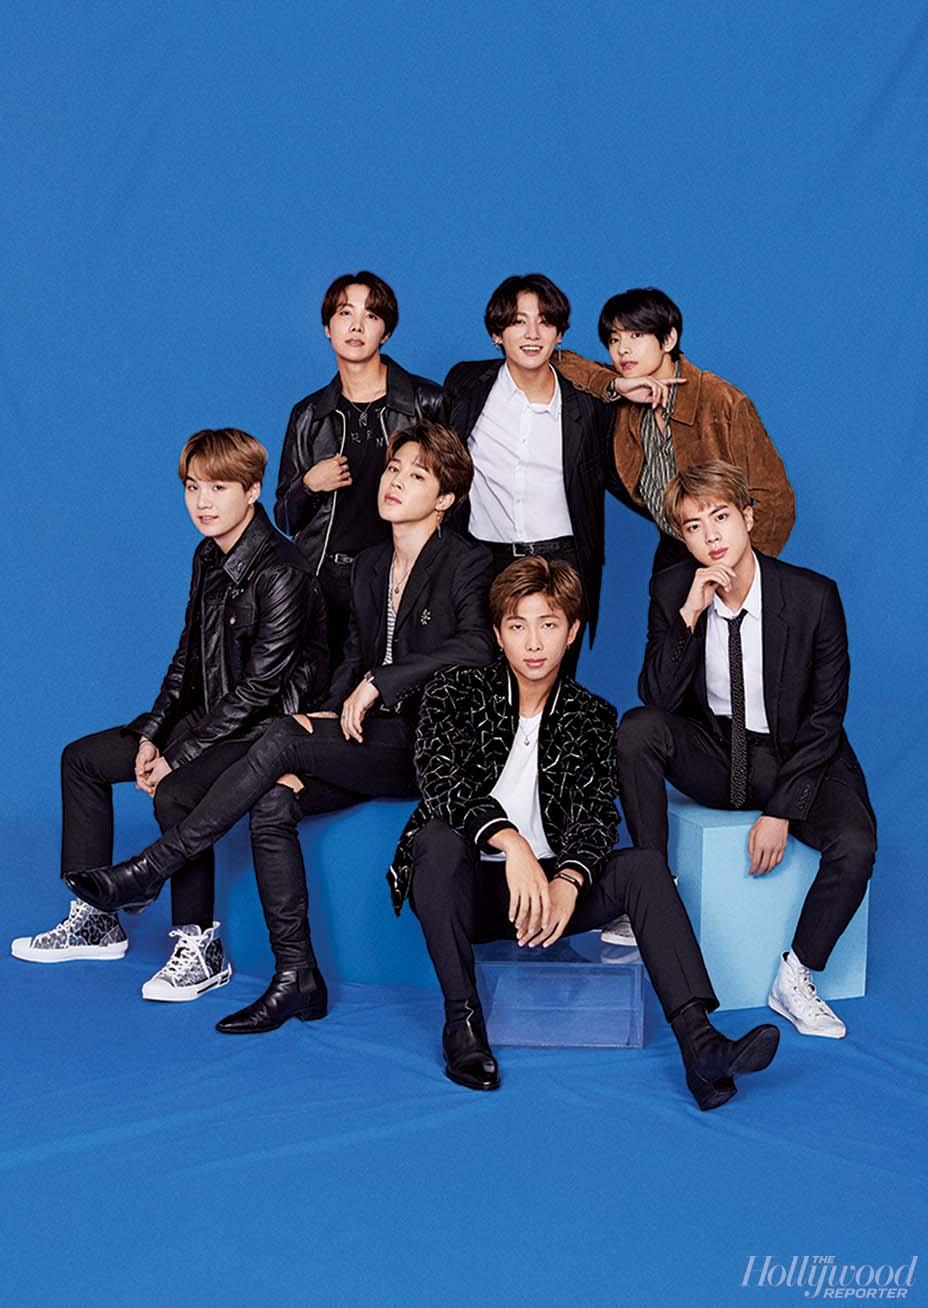 BTS Is Back: Music's Billion-Dollar Boy Band Takes the Next Step | Bts photo,  Album bts, Bts boys